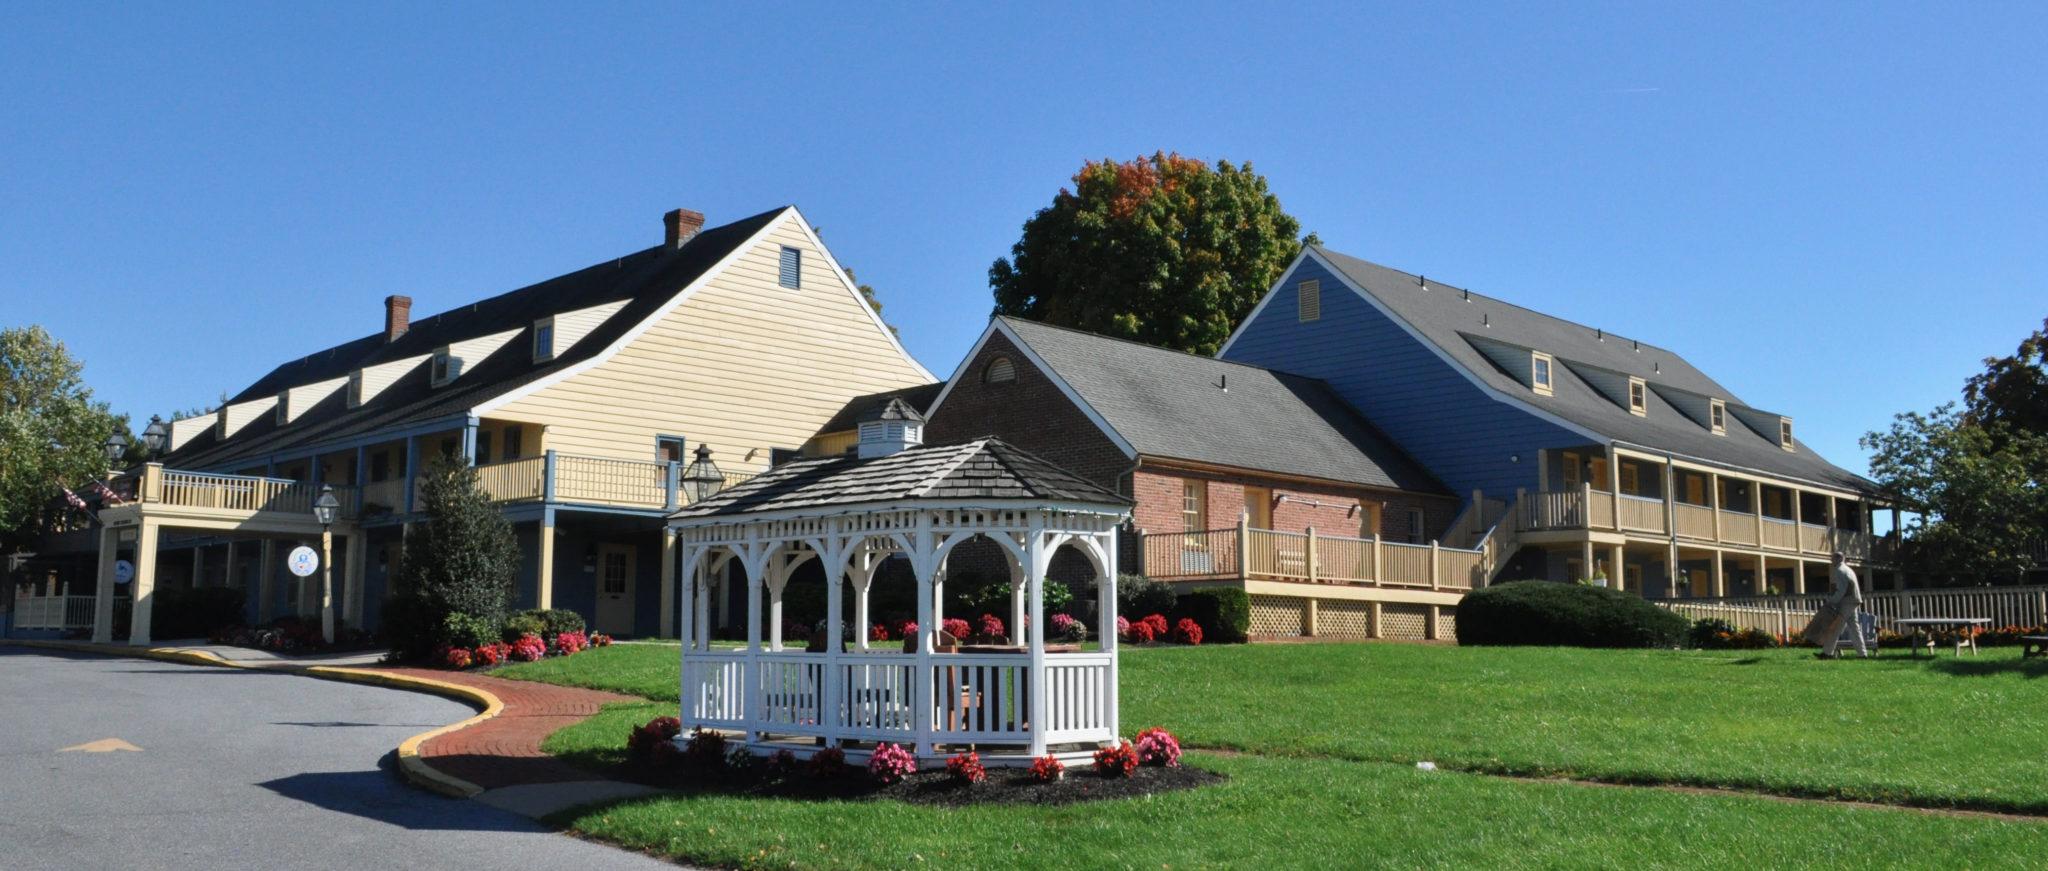 Clarion Inn Historic Strasburg Hotel Lancaster PA Hotel